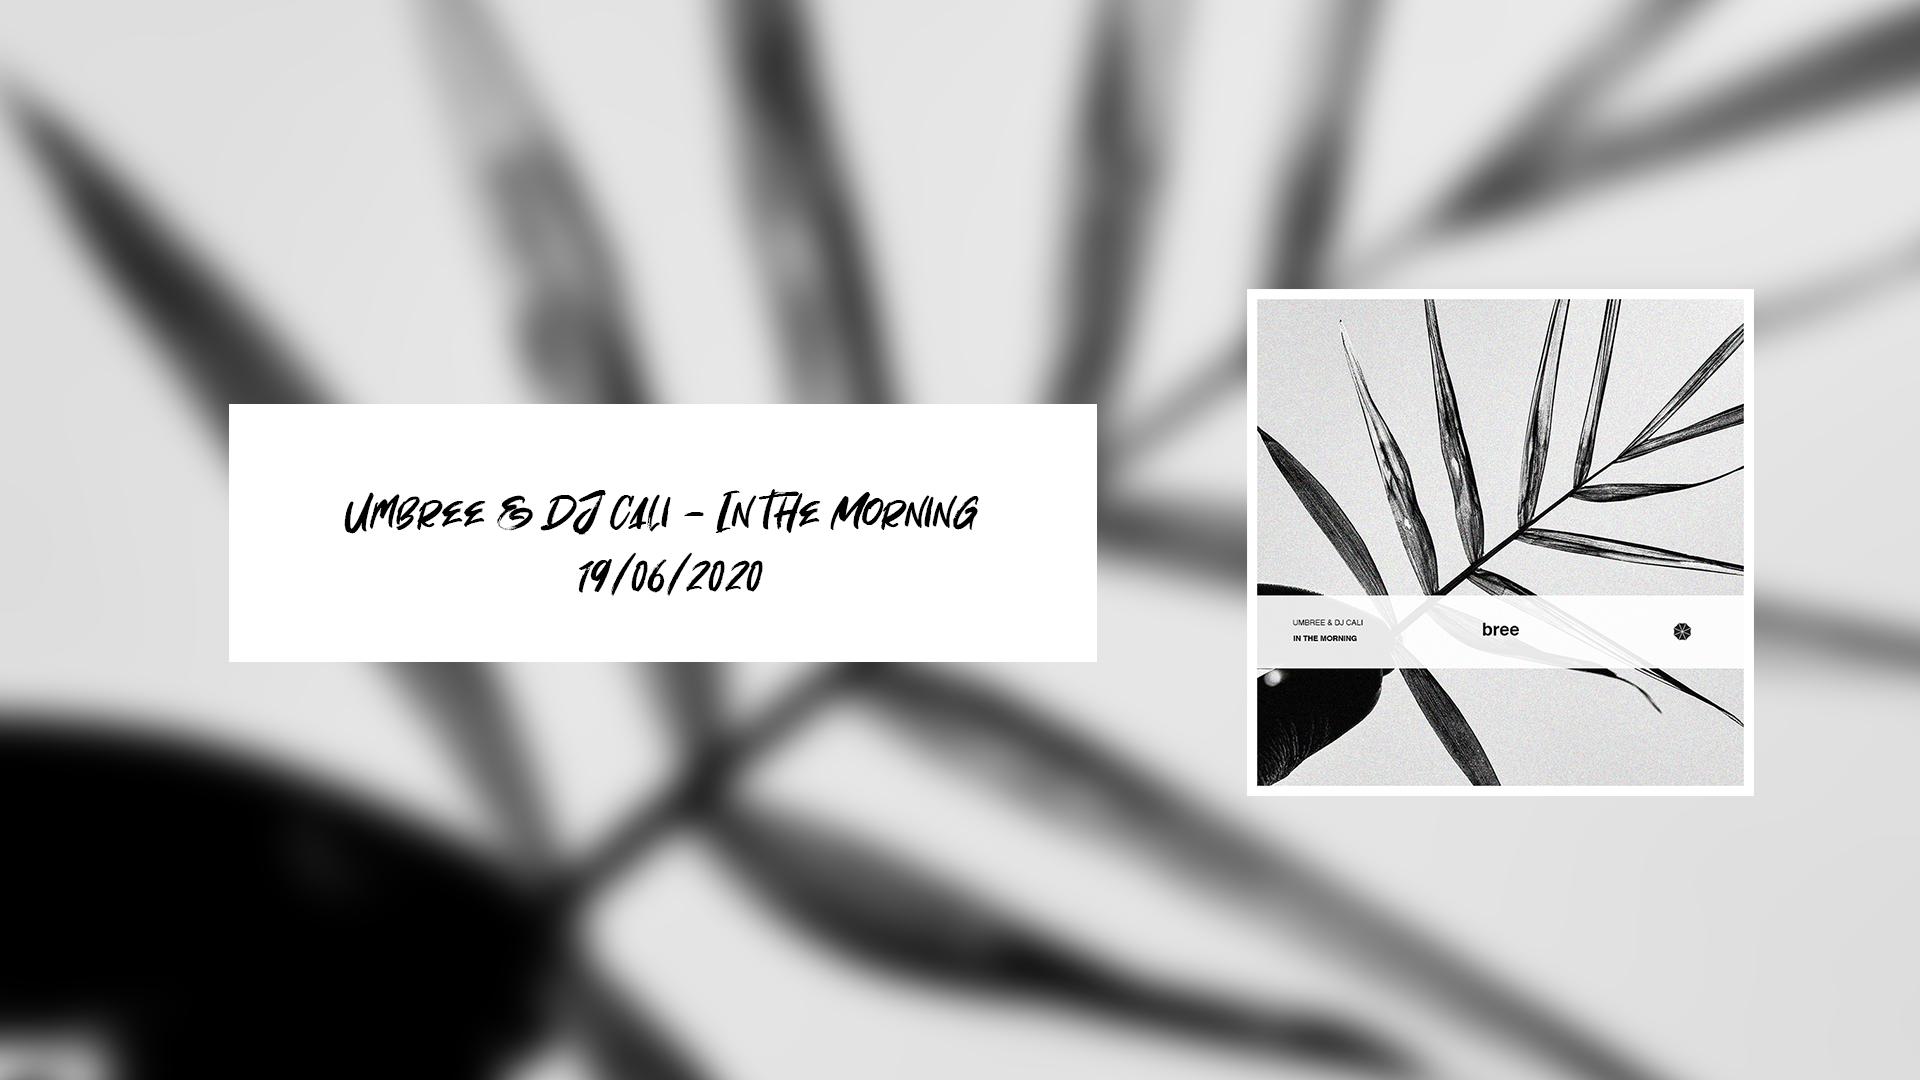 Cover de la collaboration entre Umbree et DJ Cali